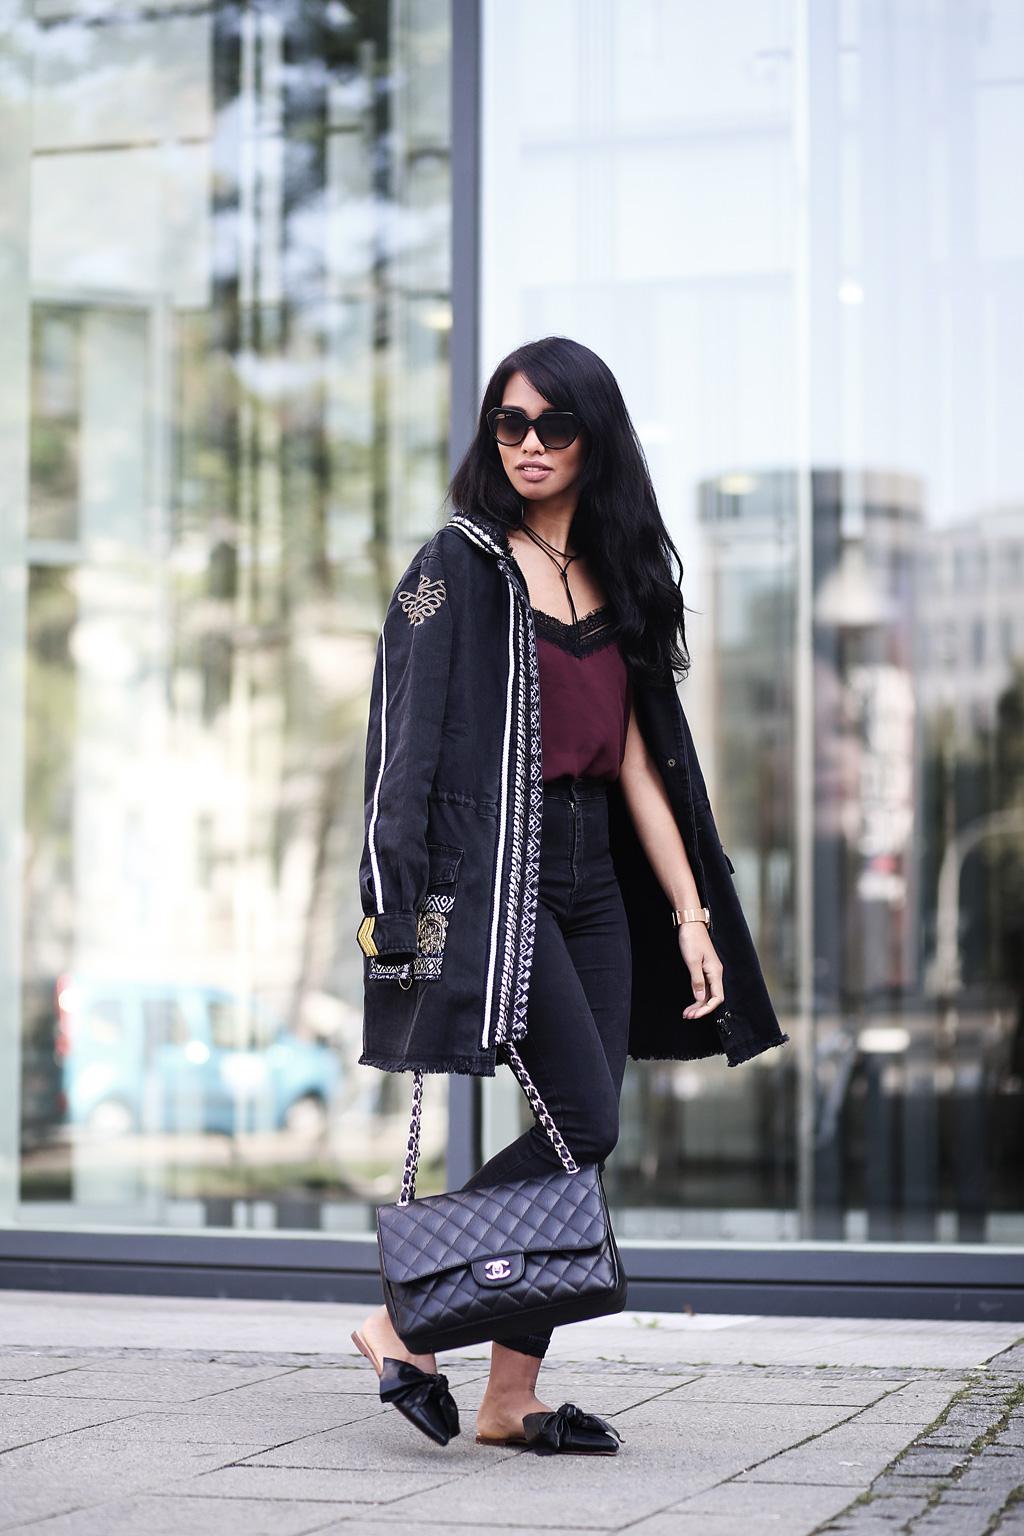 thefashionanarchy_blogger_fashionblog_modeblog_styleblog_fashionblog_outfit_exotic_denim_desigual_streetstyle_look_munich_muenchen_munichblogger_styleblog_chanel_slipper_1